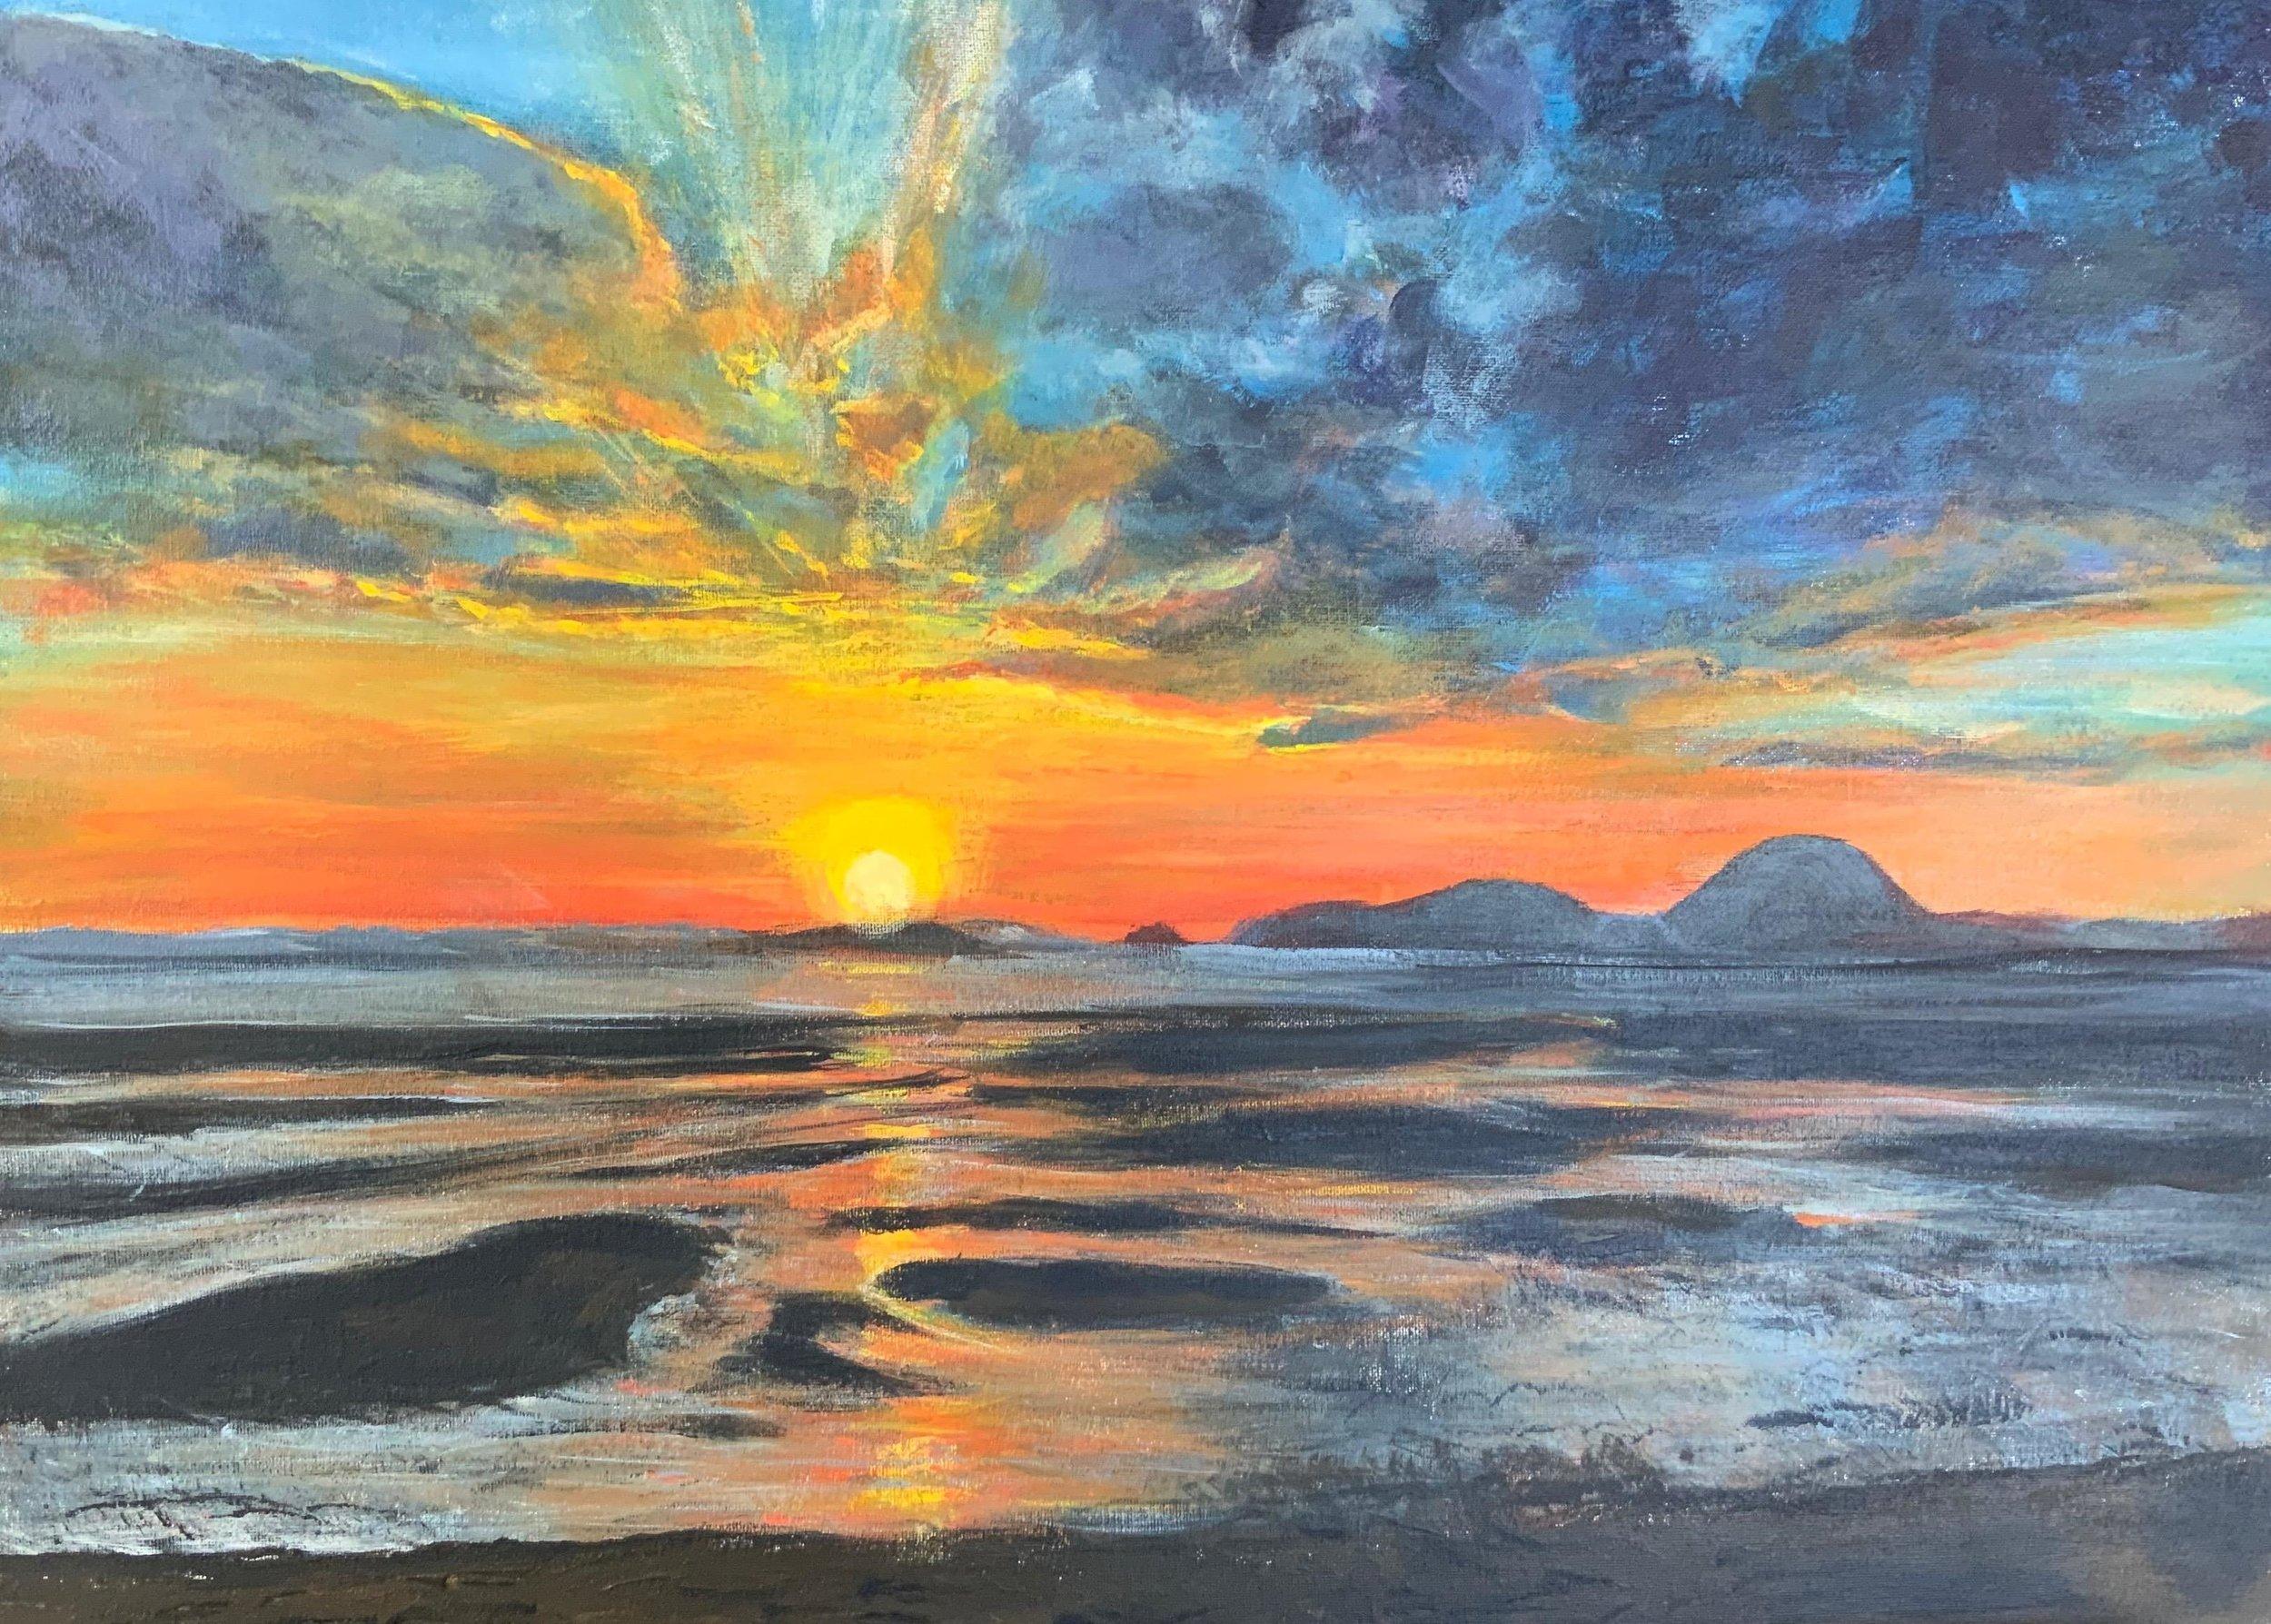 Print 18 - Thai Sunset - Size: 275 x 197